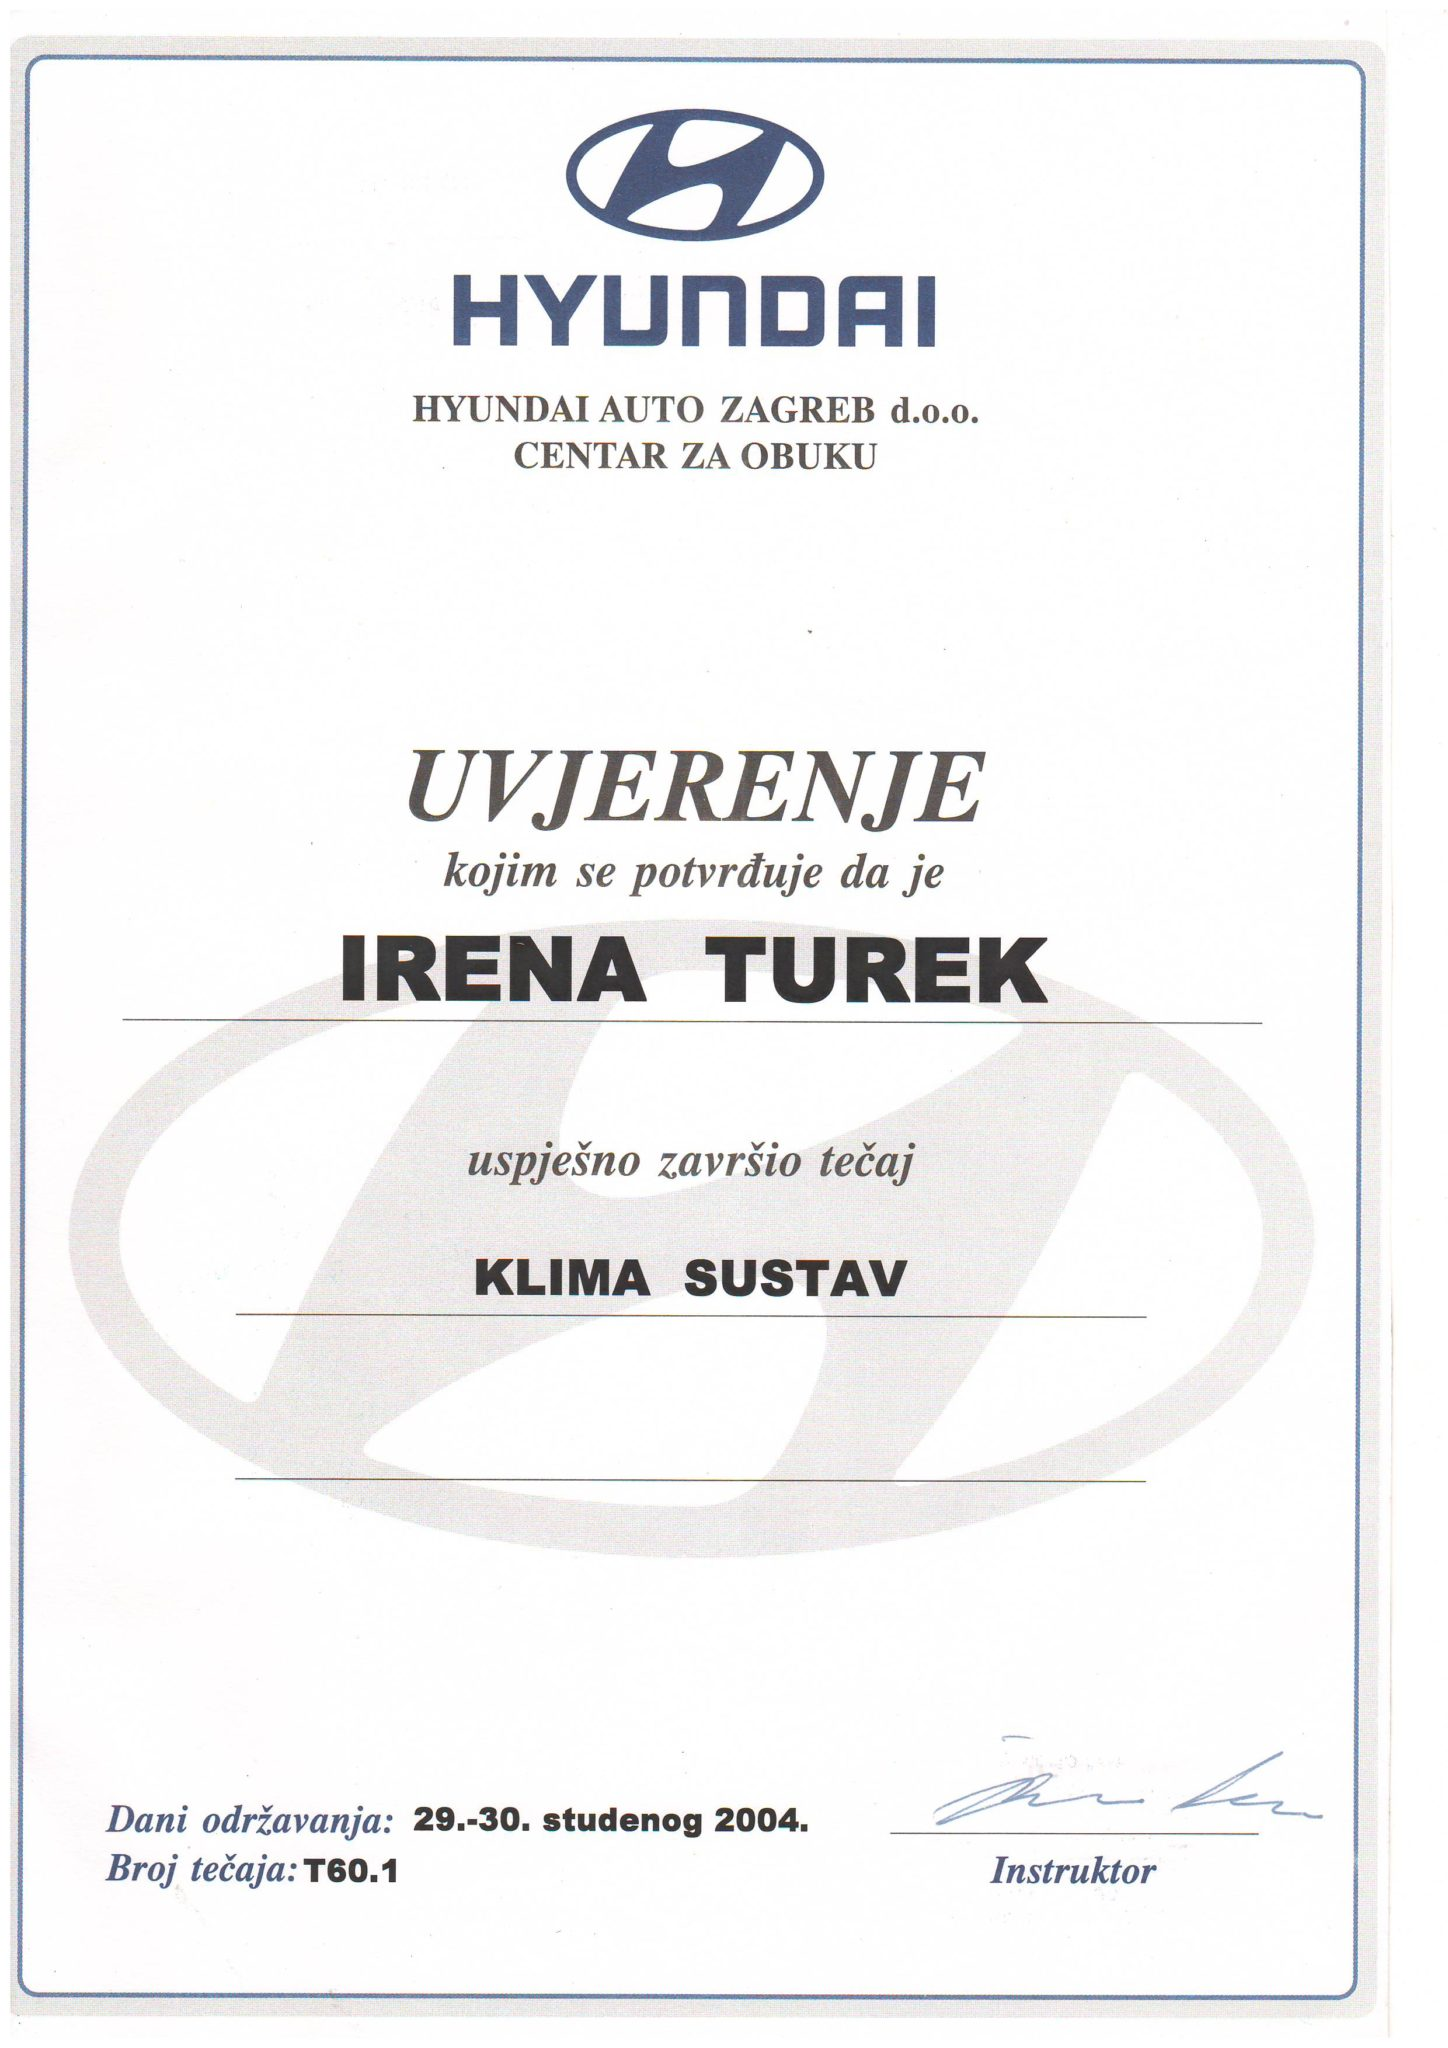 Picture of Hyundai - Klima sustav